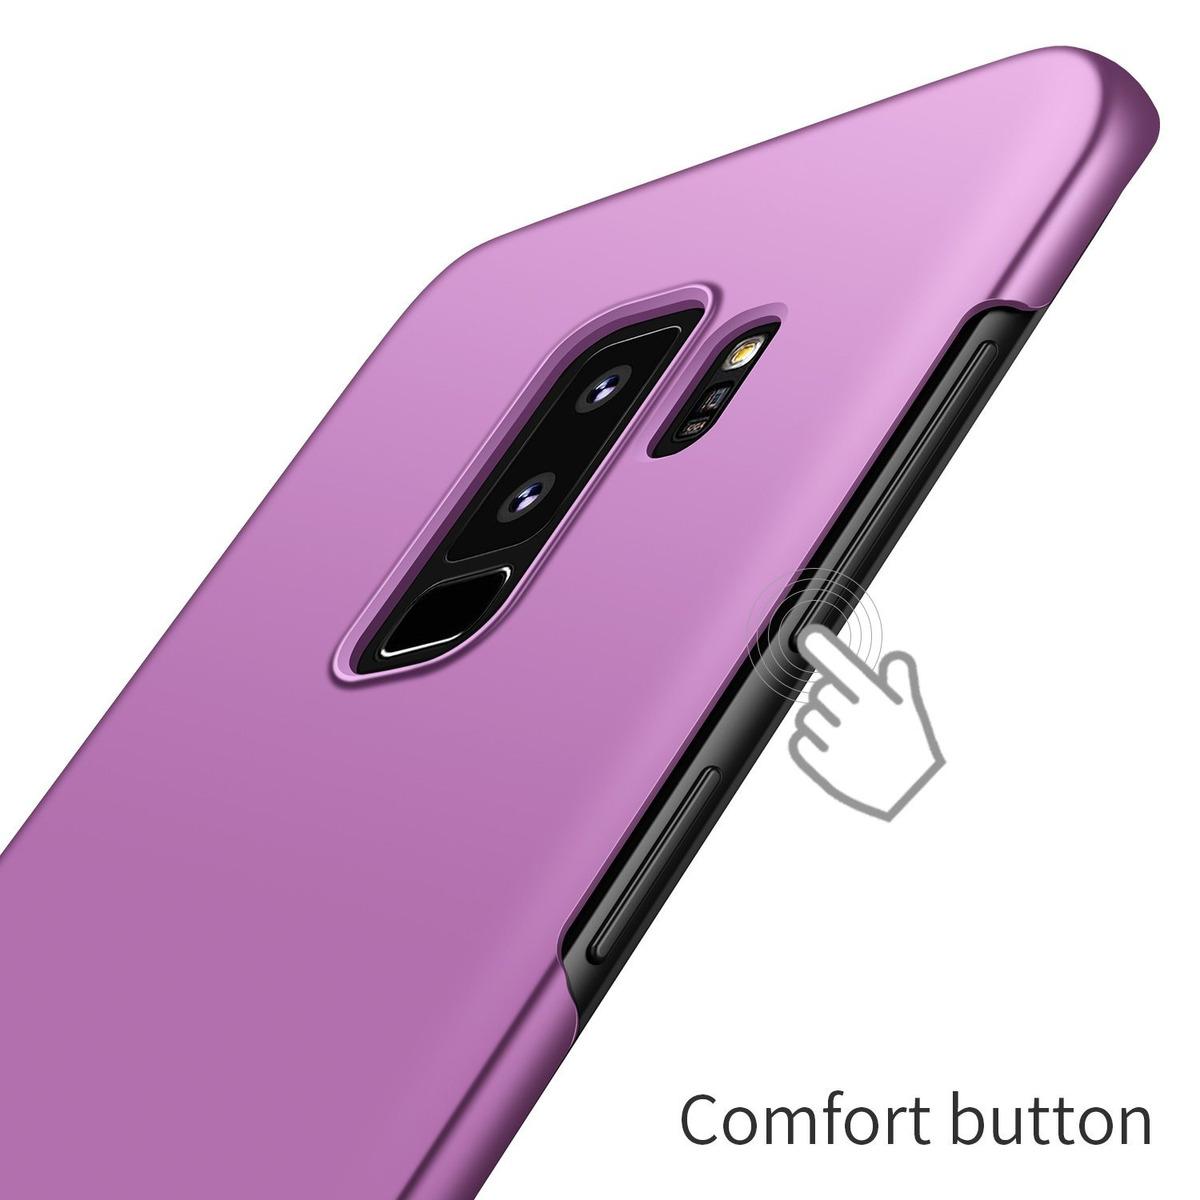 c68472f3ac0 fundas gada teléfono samsung galaxy s9 plus púrpura liso. Cargando zoom.